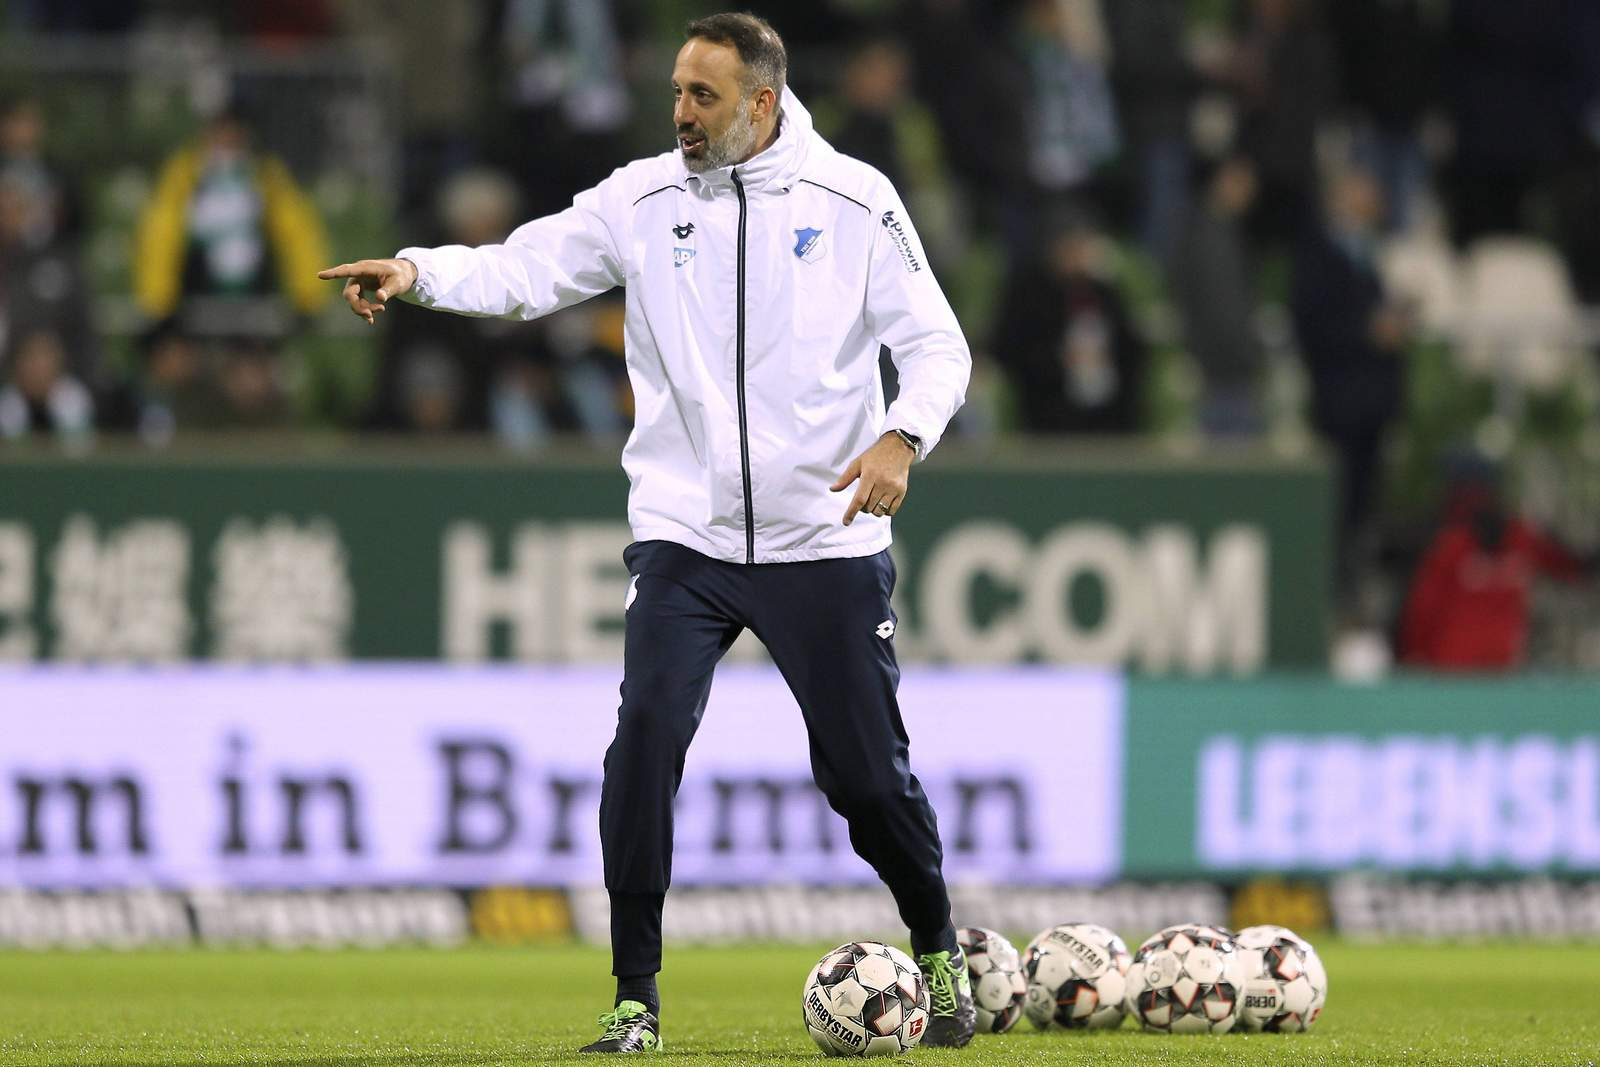 Pellegrino Matarazzo bei der TSG Hoffenheim